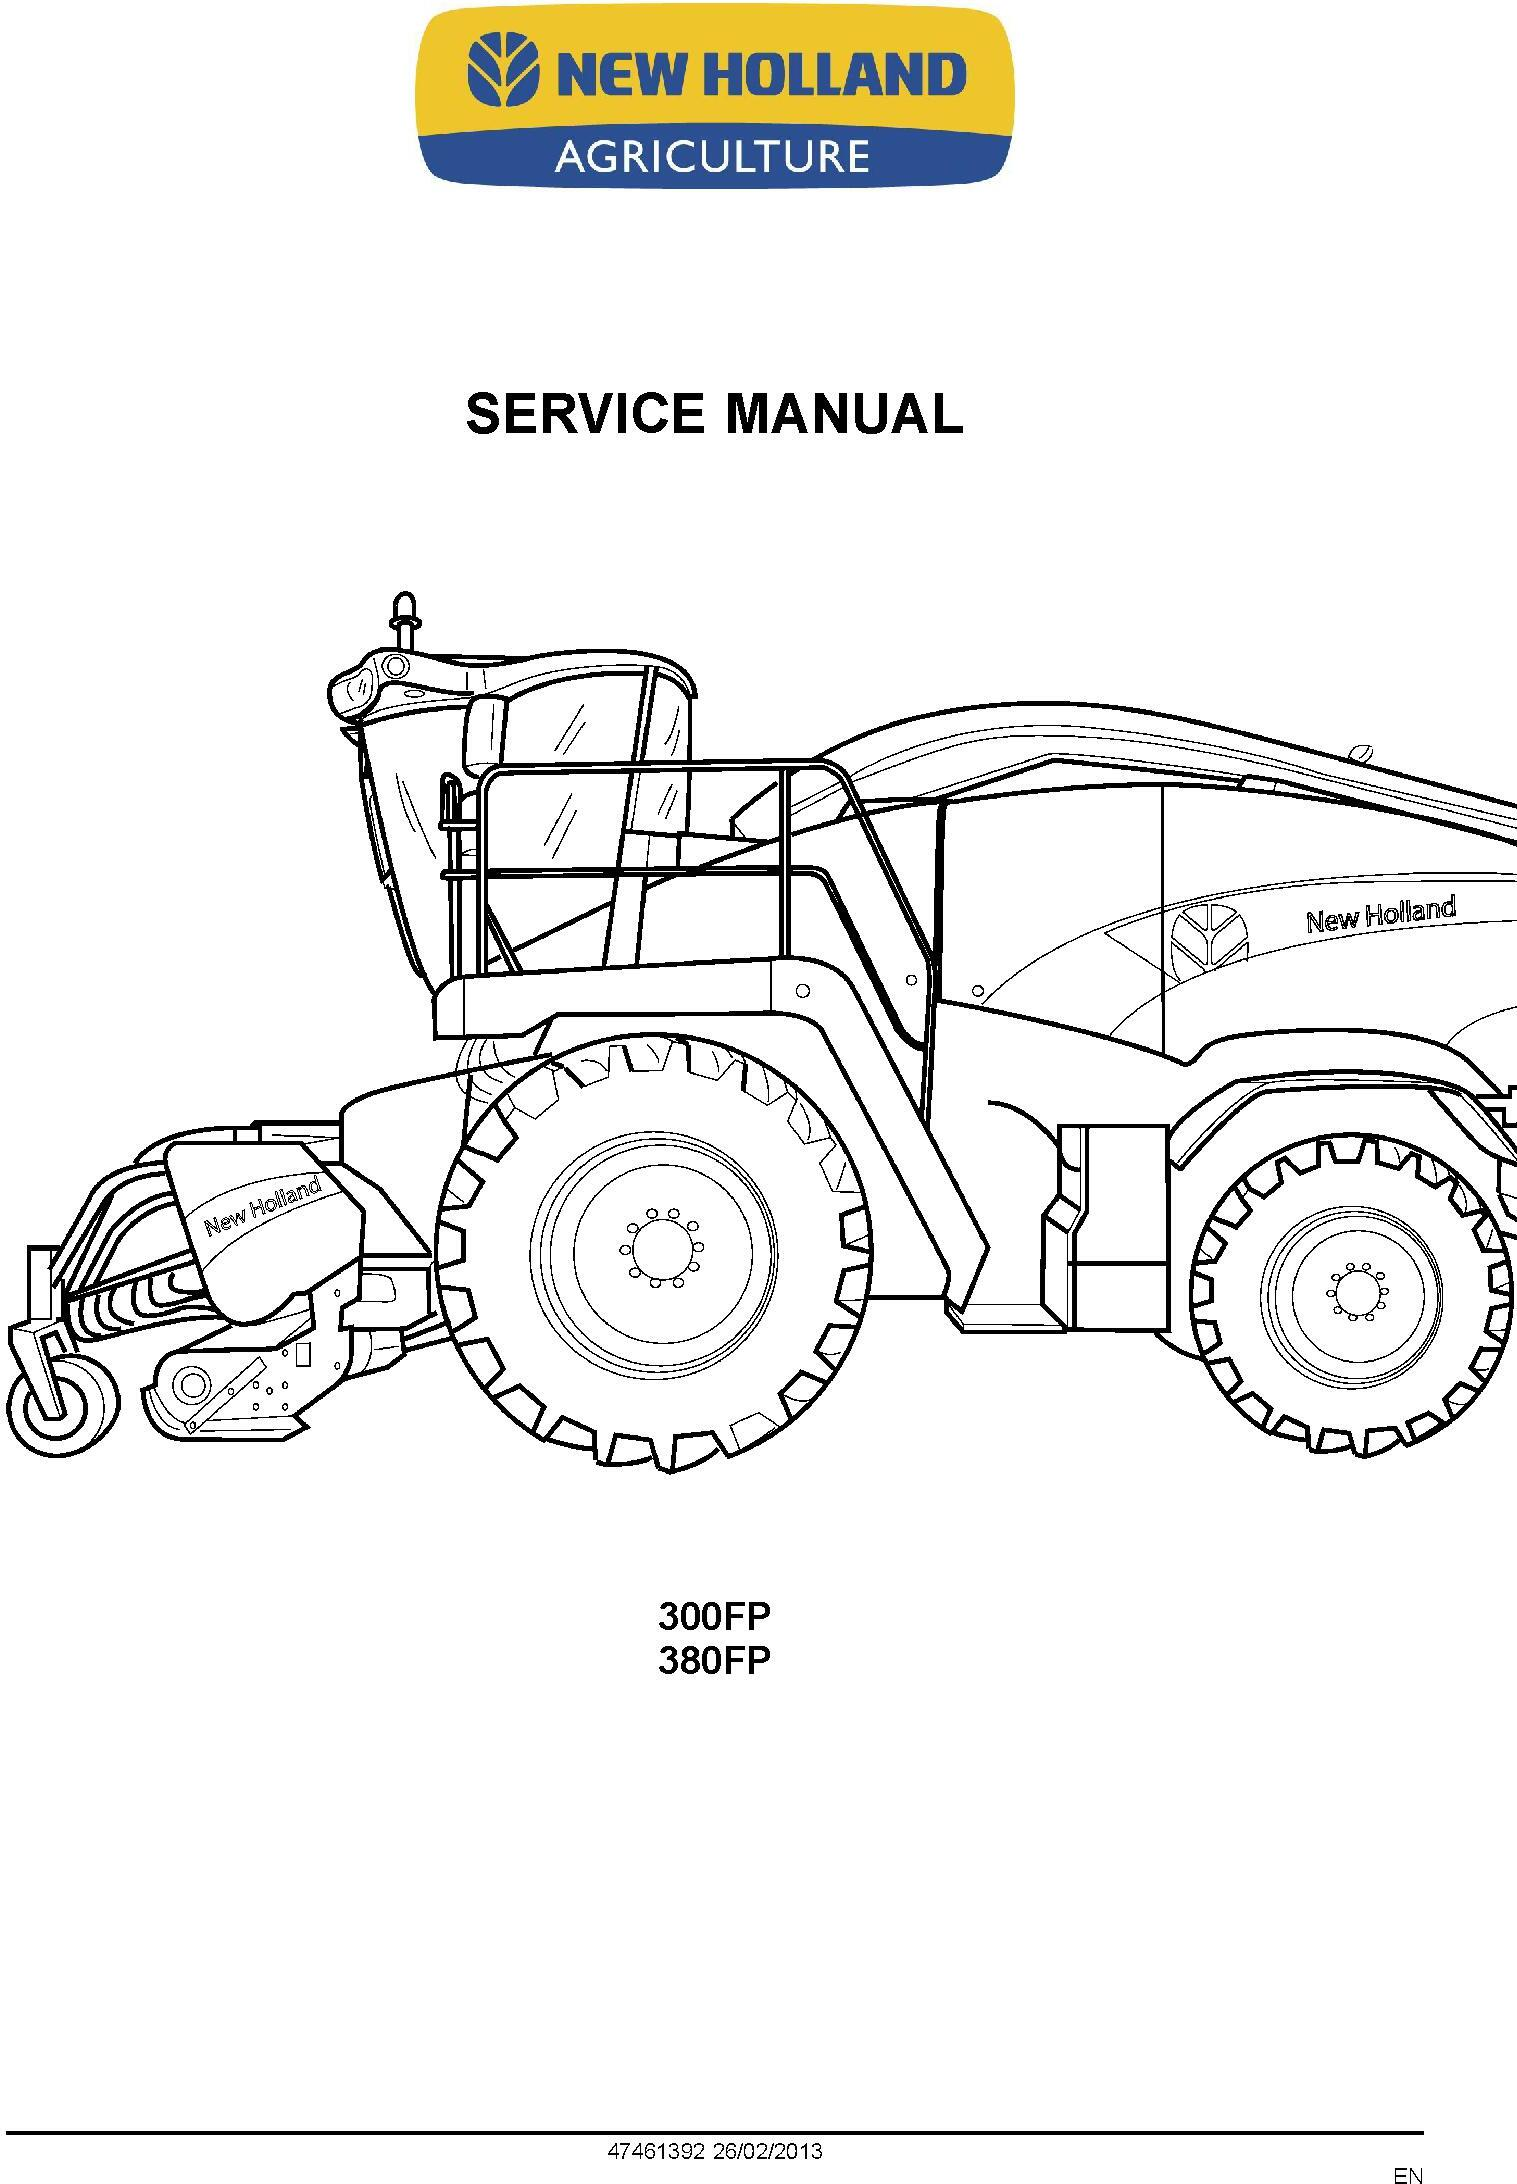 New Holland 300FP, 380FP Header Service Manual - 1